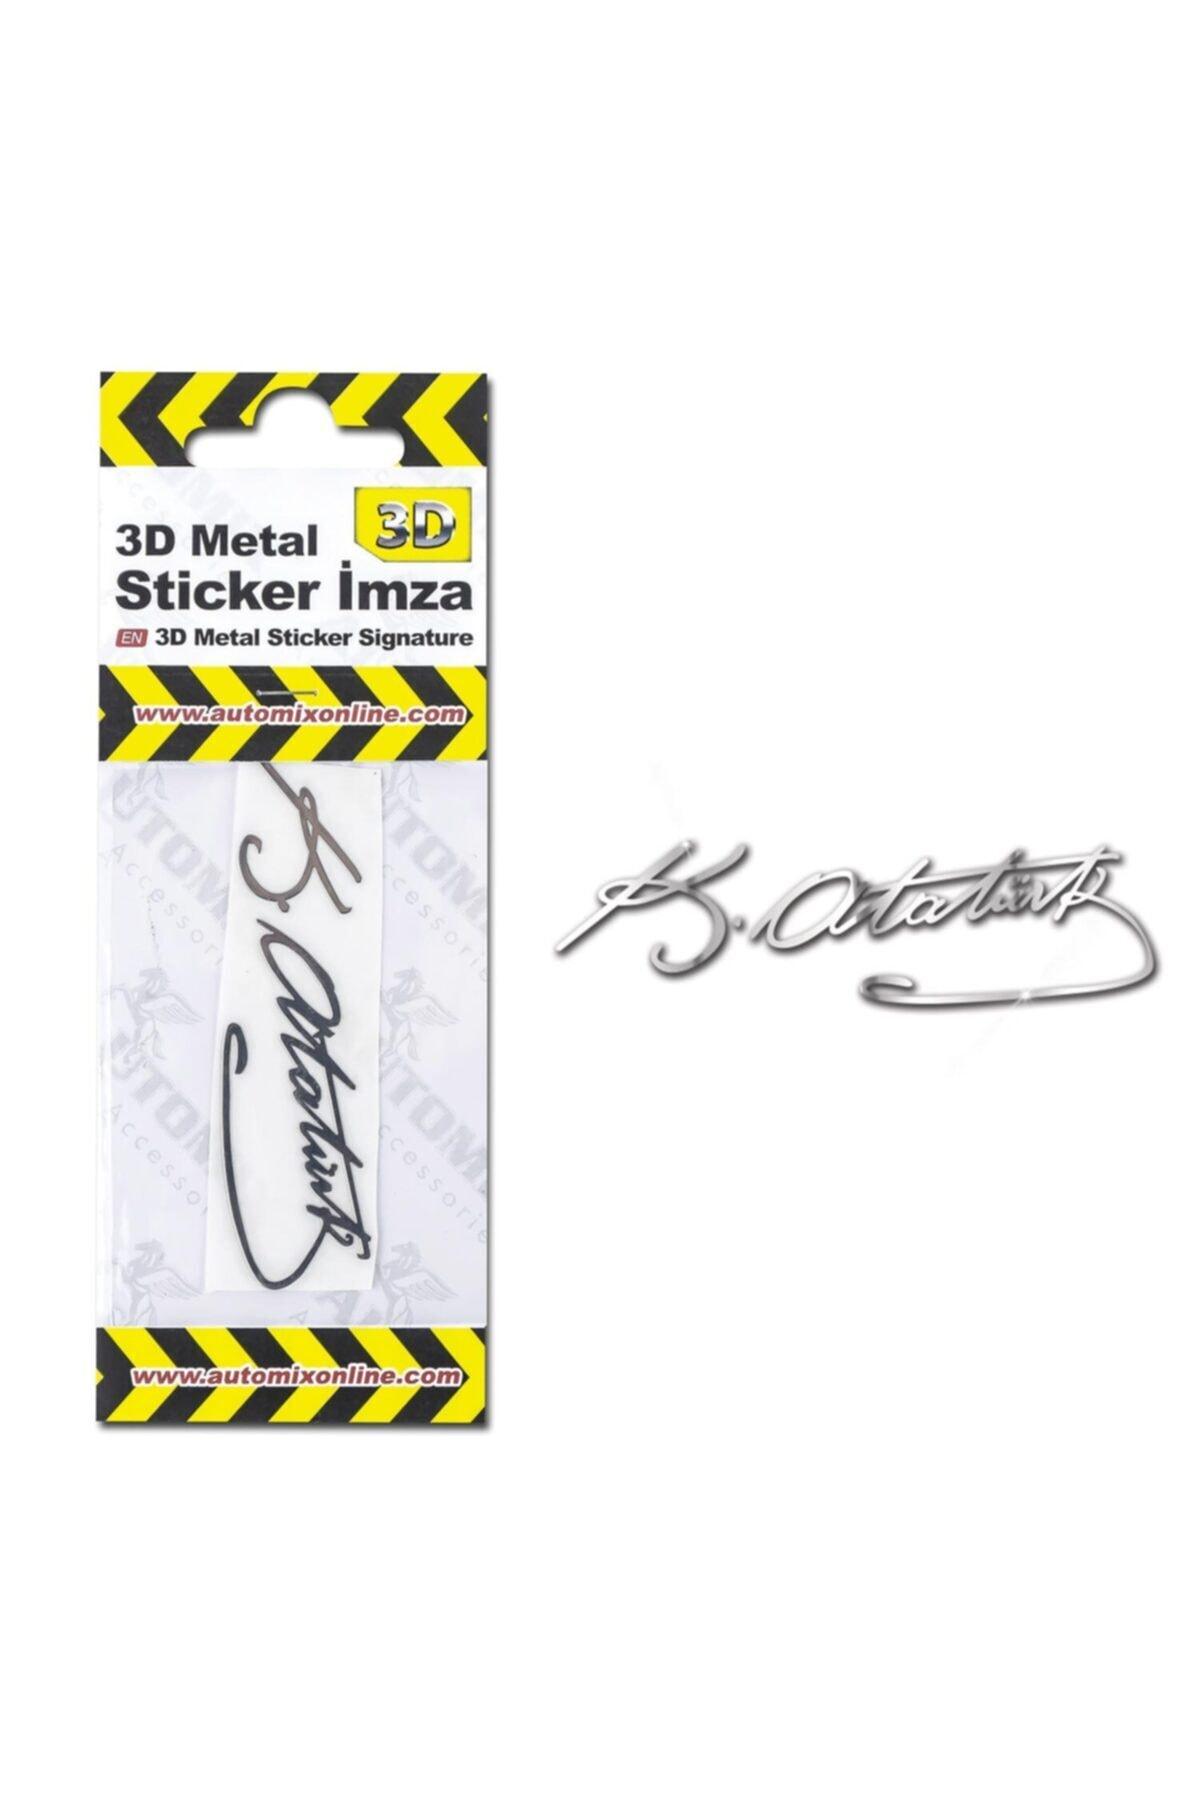 Automix 3d Metal Sticker Imza 2